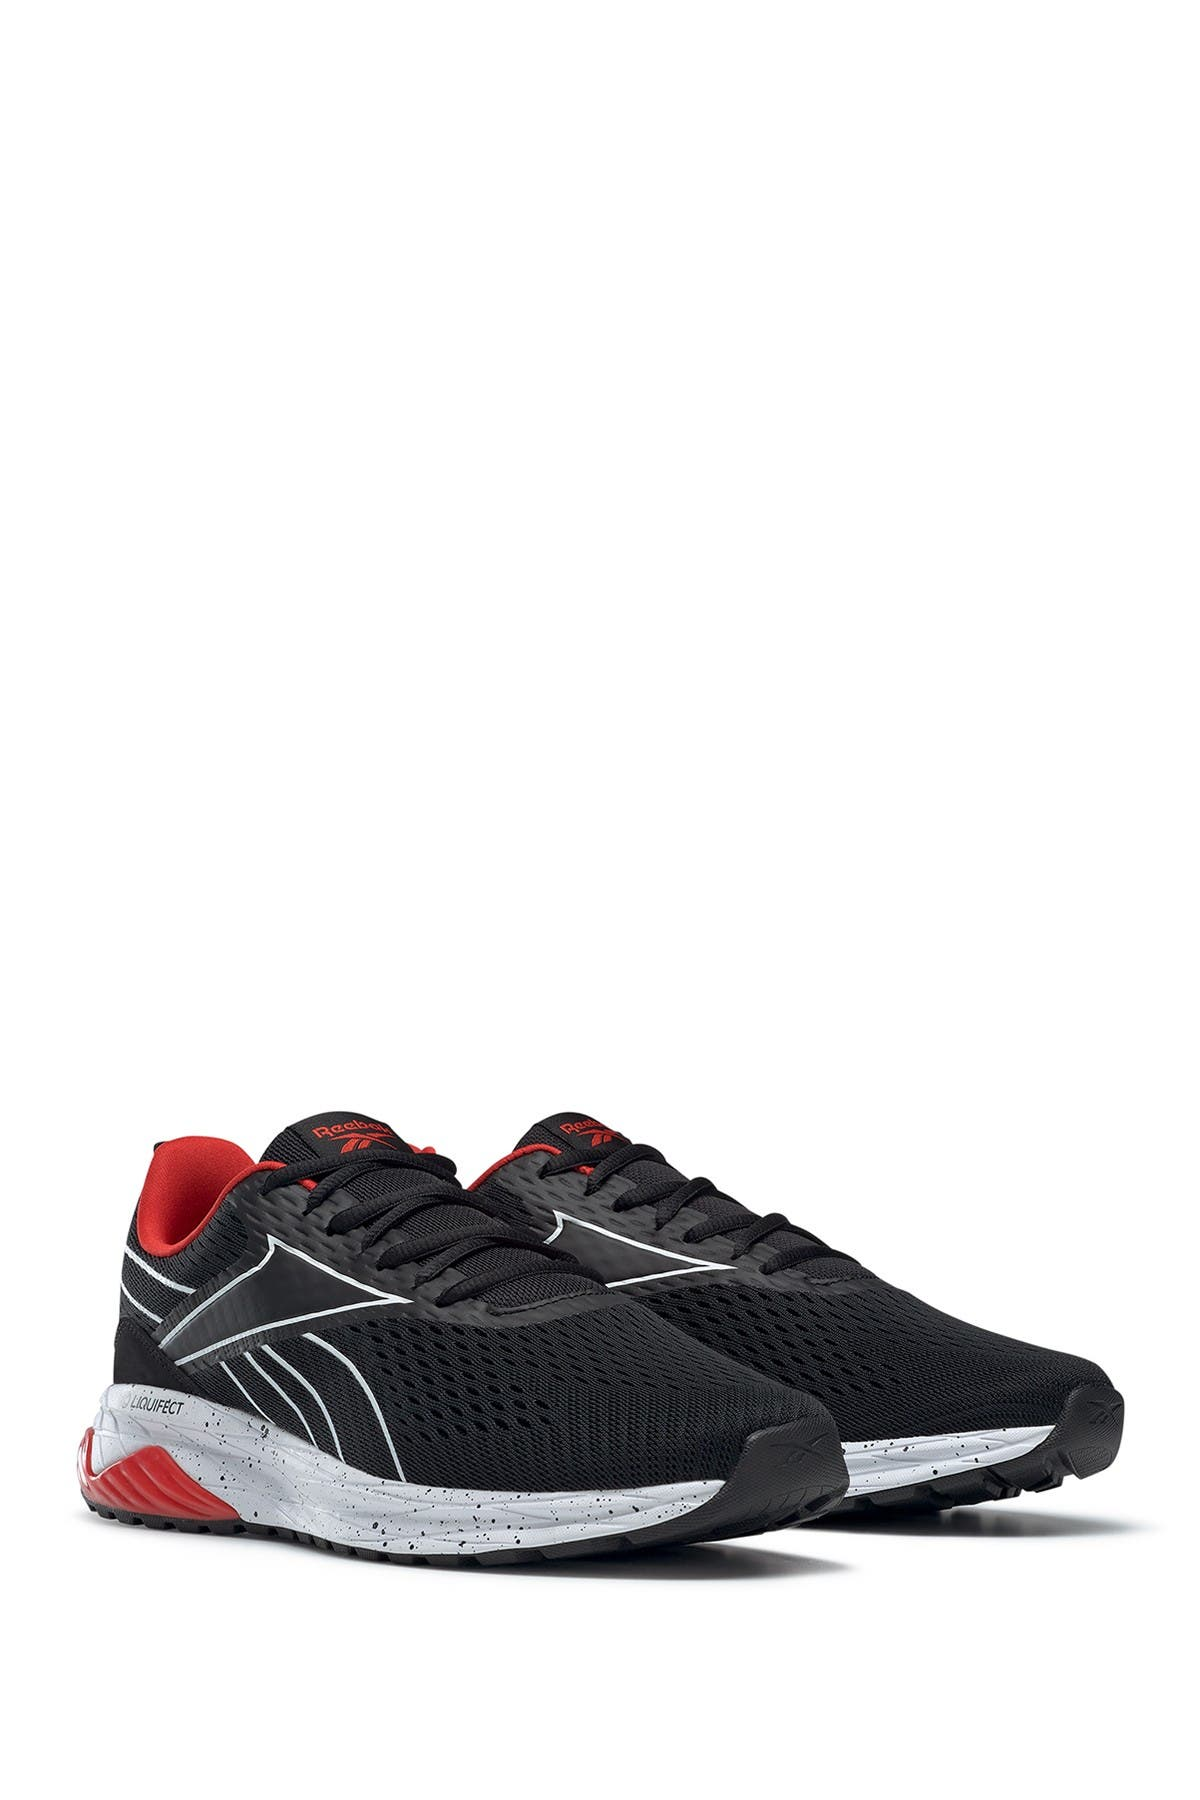 Image of Reebok Liquifect 180 2.0 Sneaker